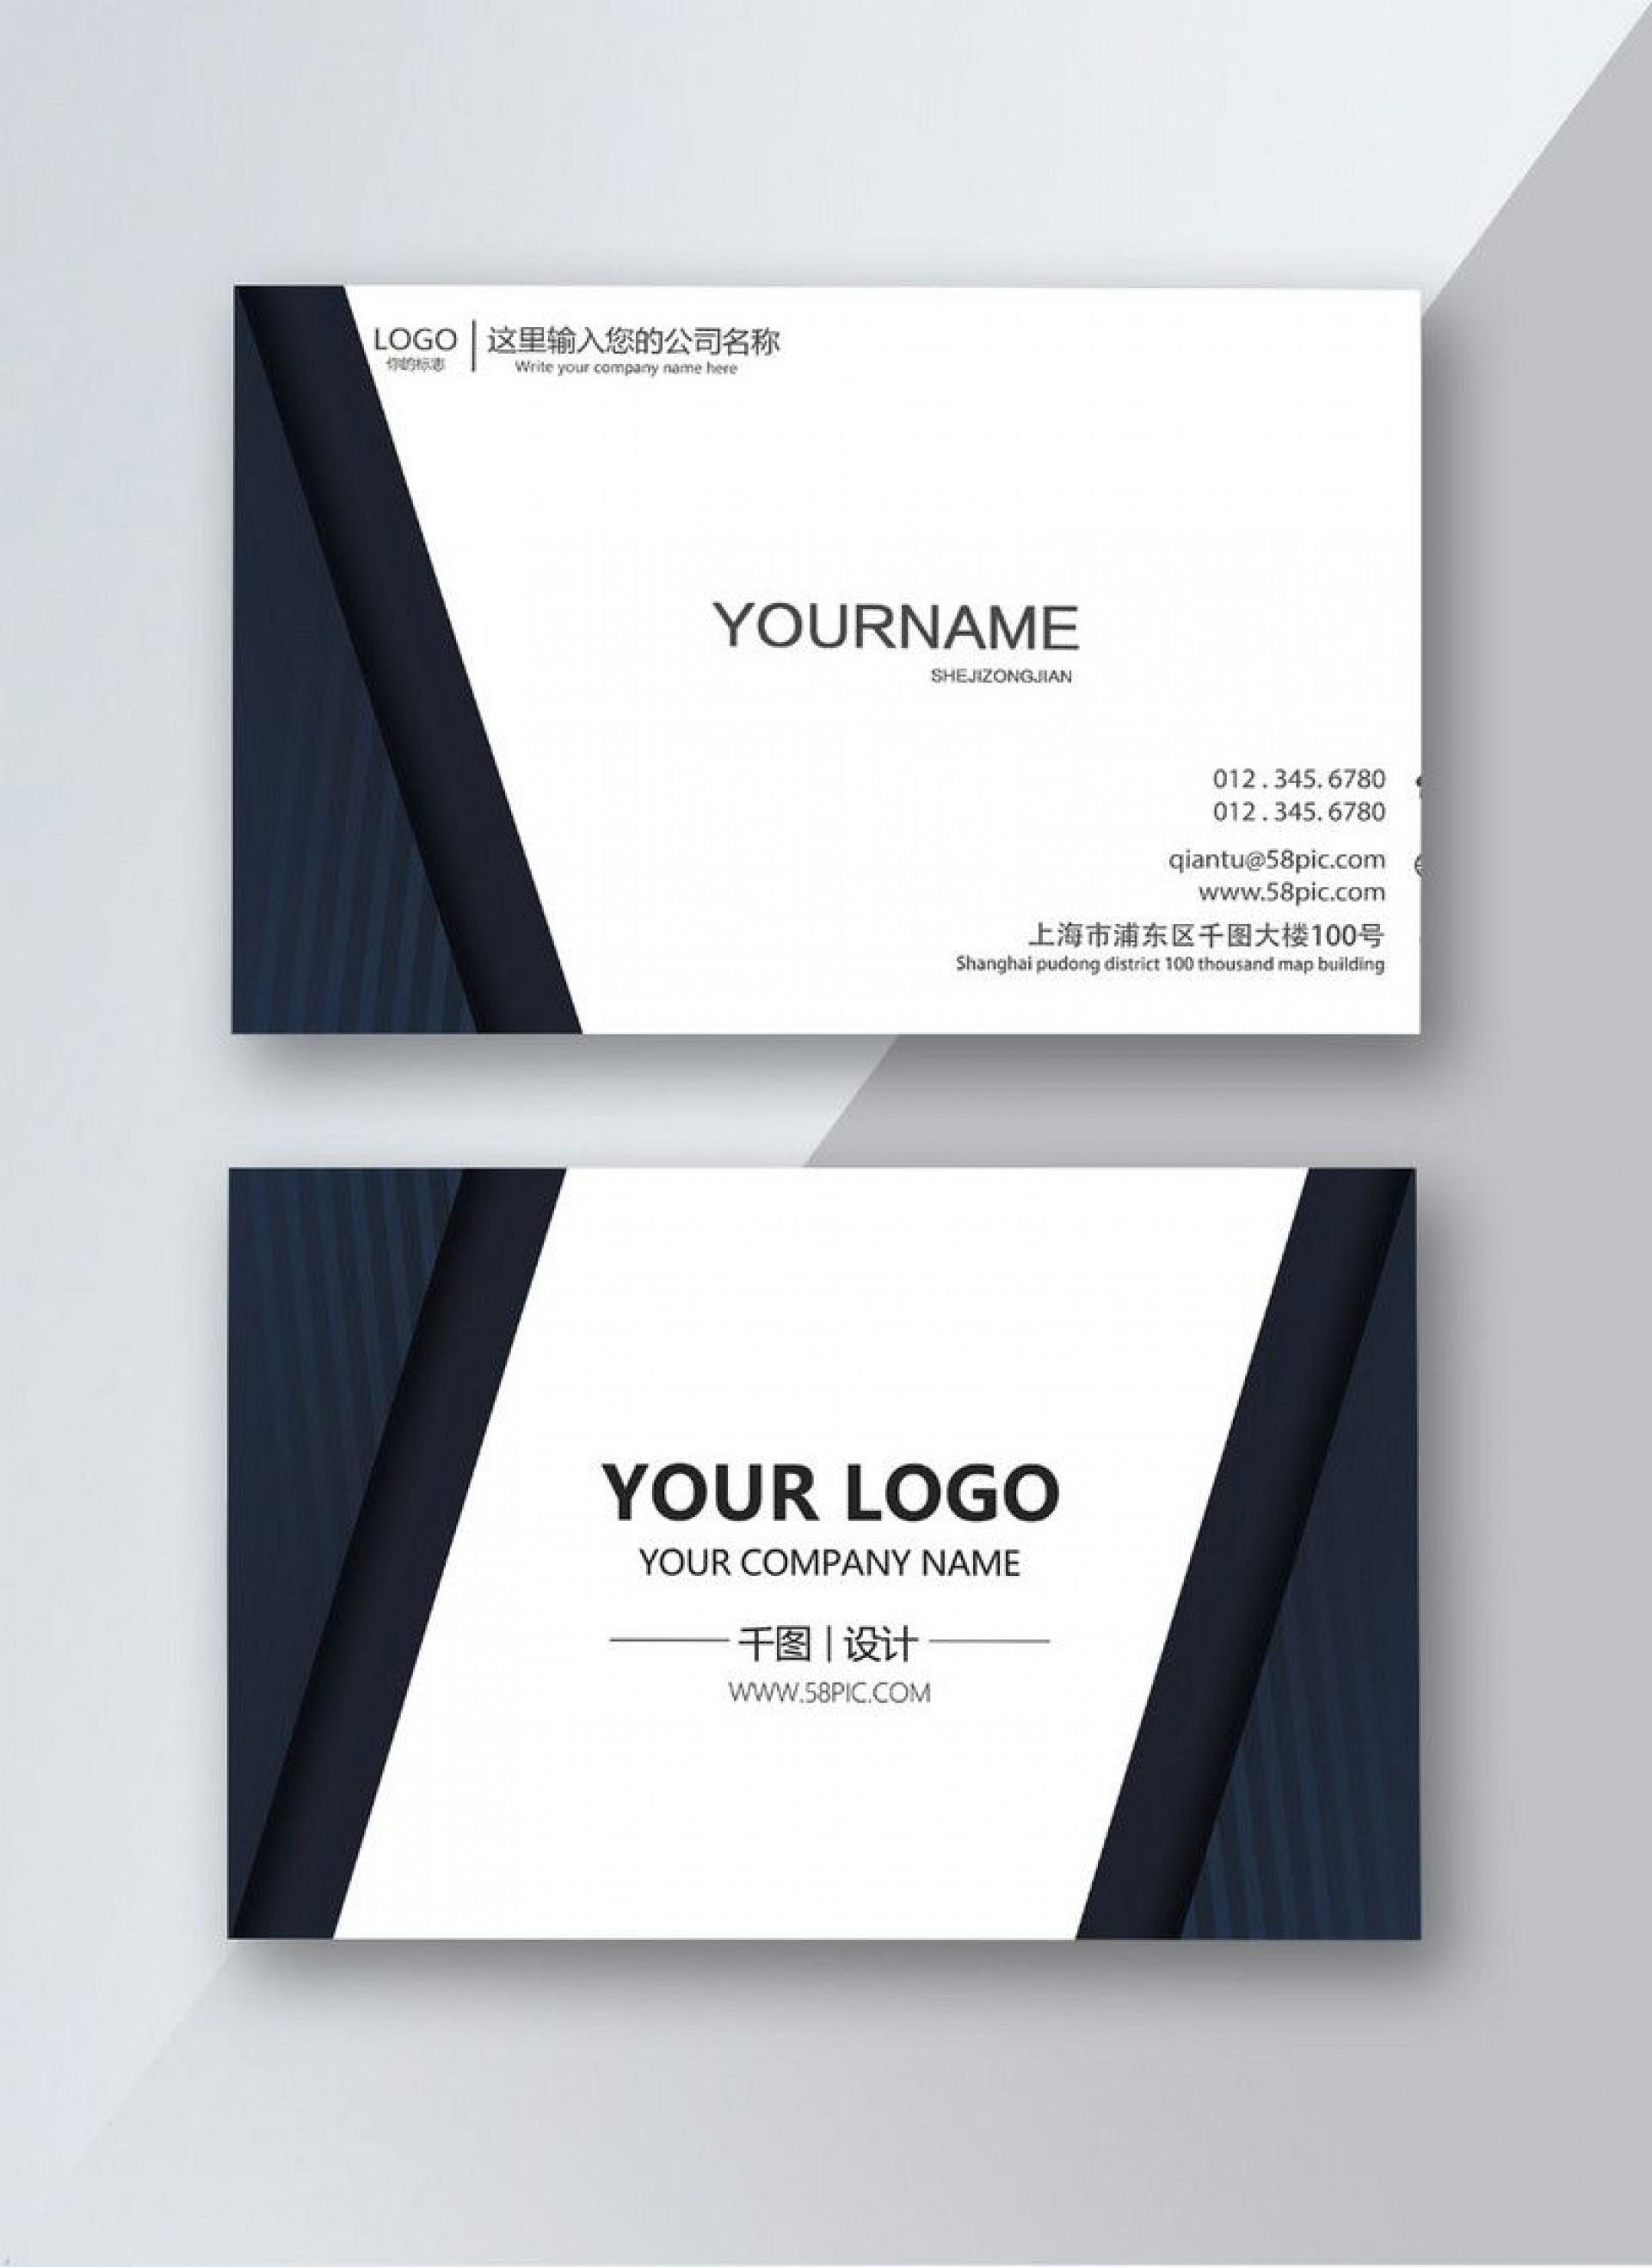 003 Unbelievable Folding Busines Card Template Image  Folded Photoshop Ai Free1920